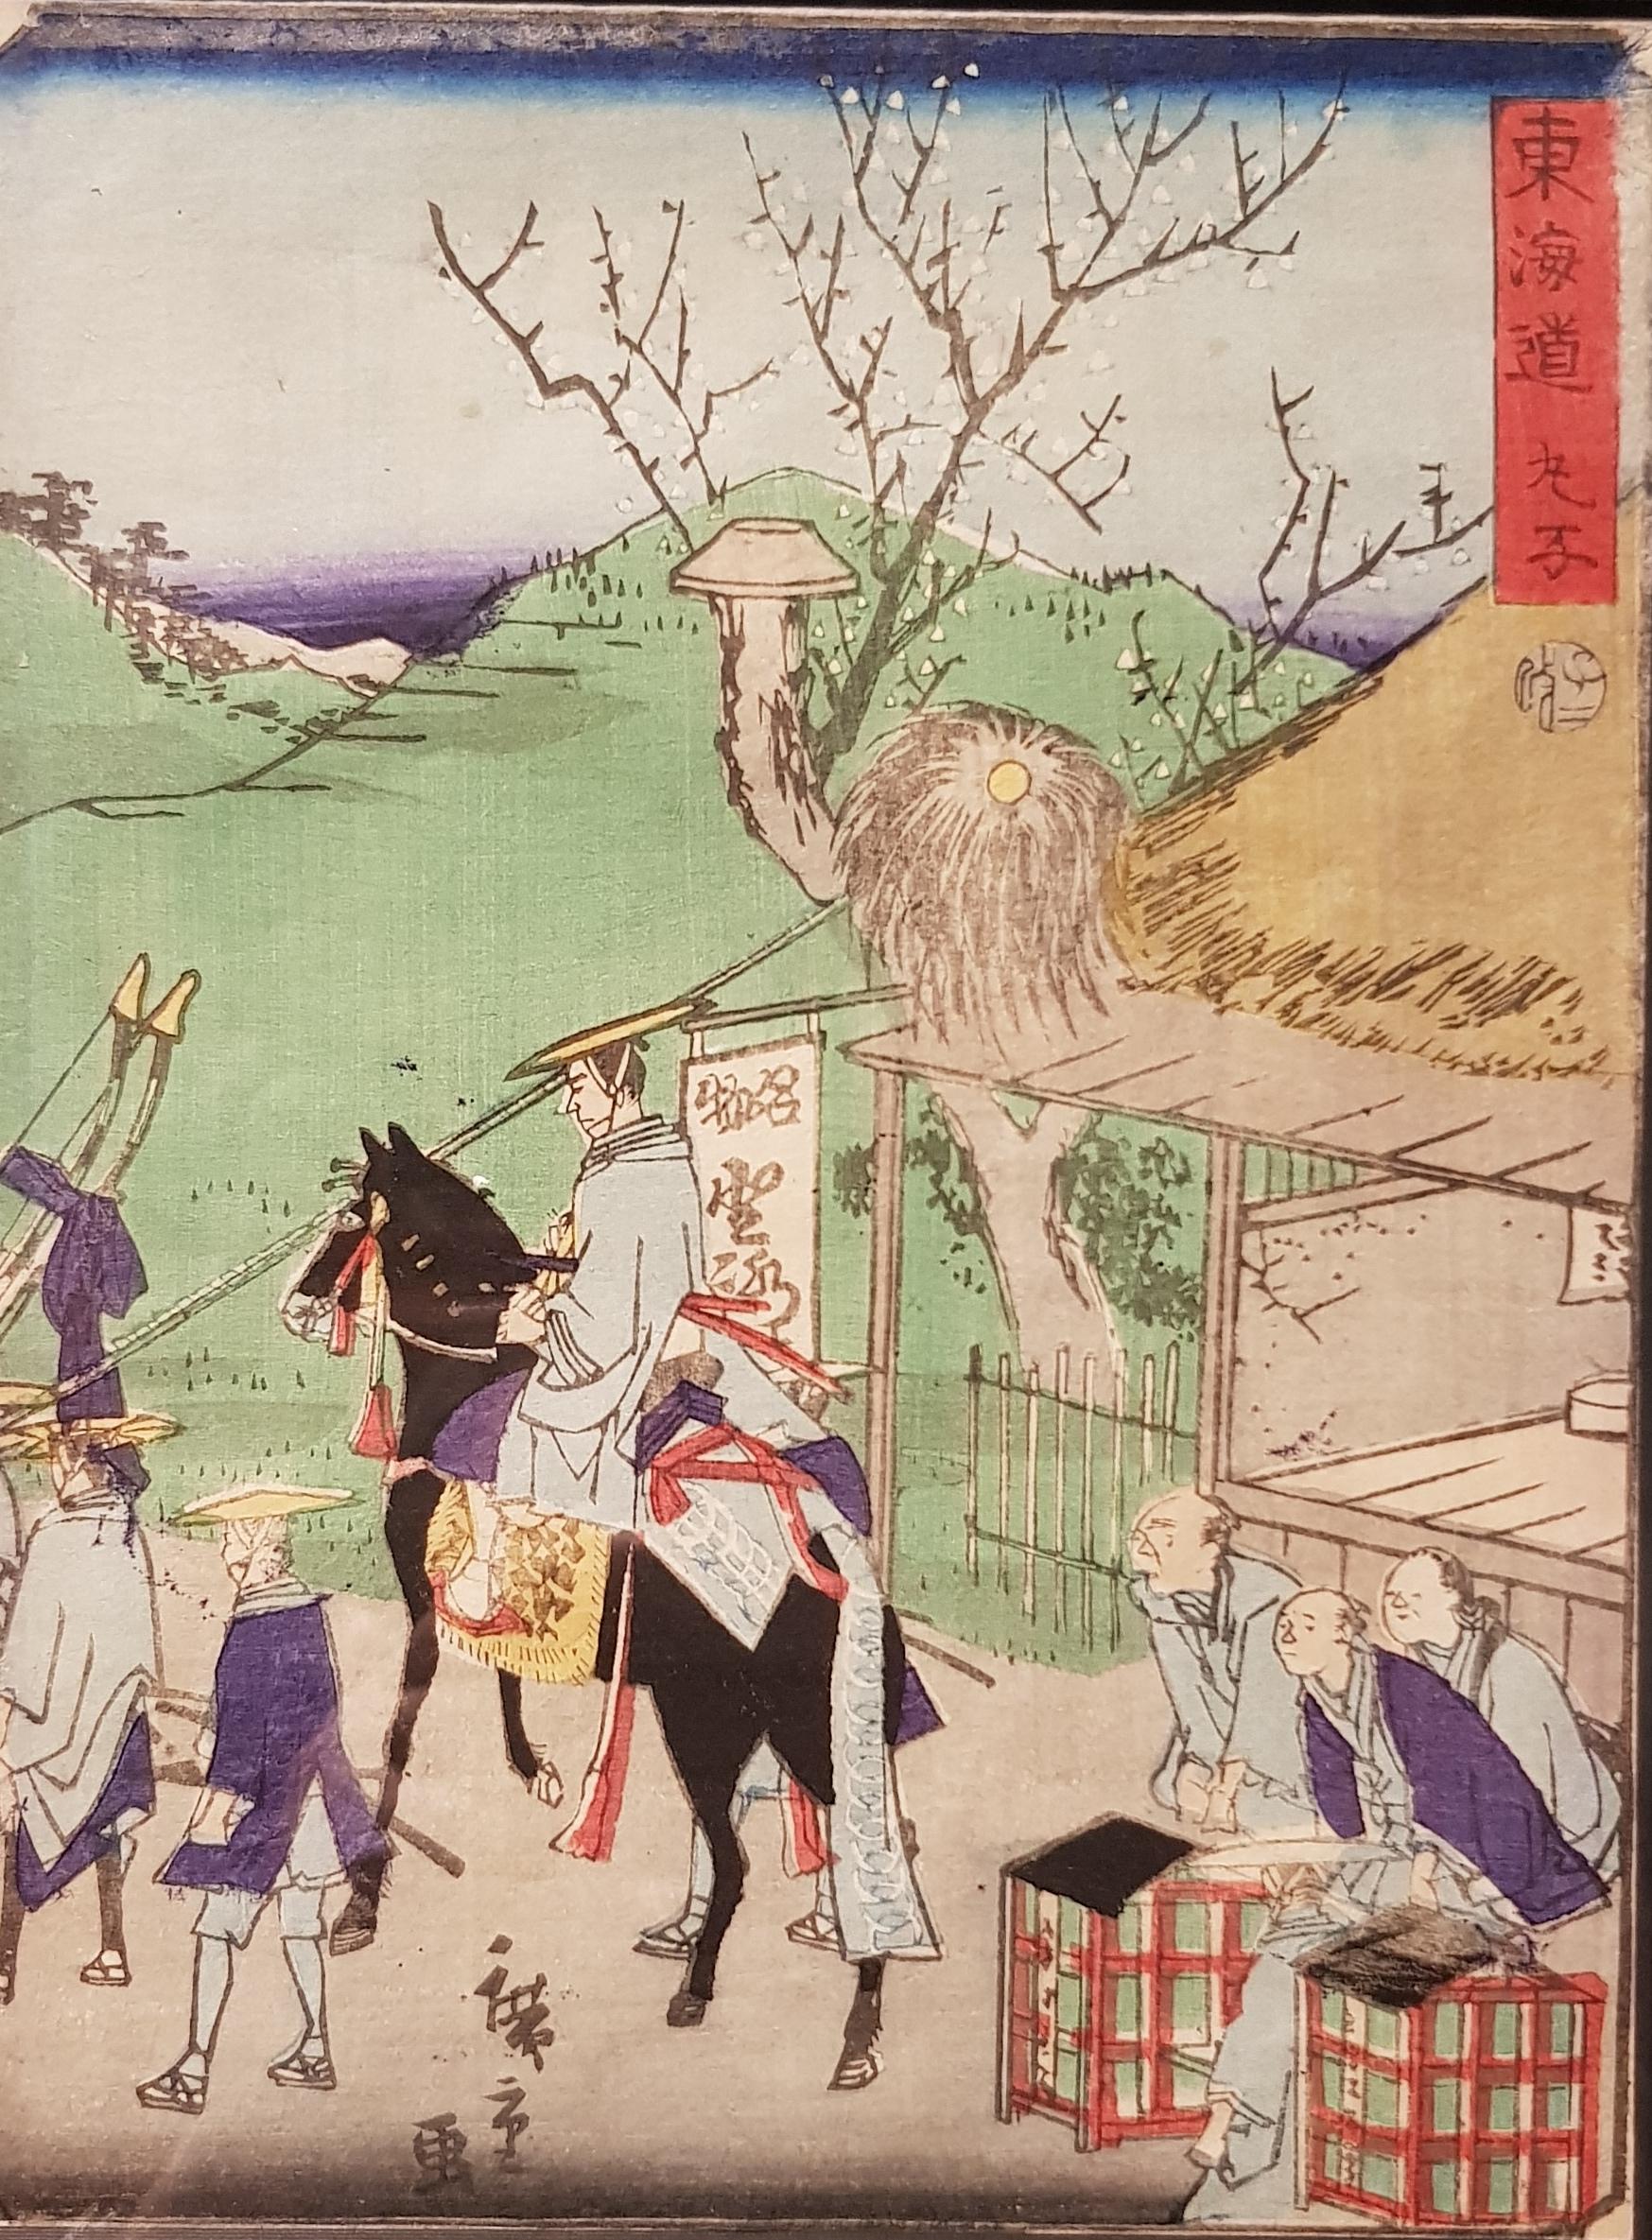 Japon - Estampe originale Hiroshige II - Tokaïdo - Mariko - Edo 1863 Image